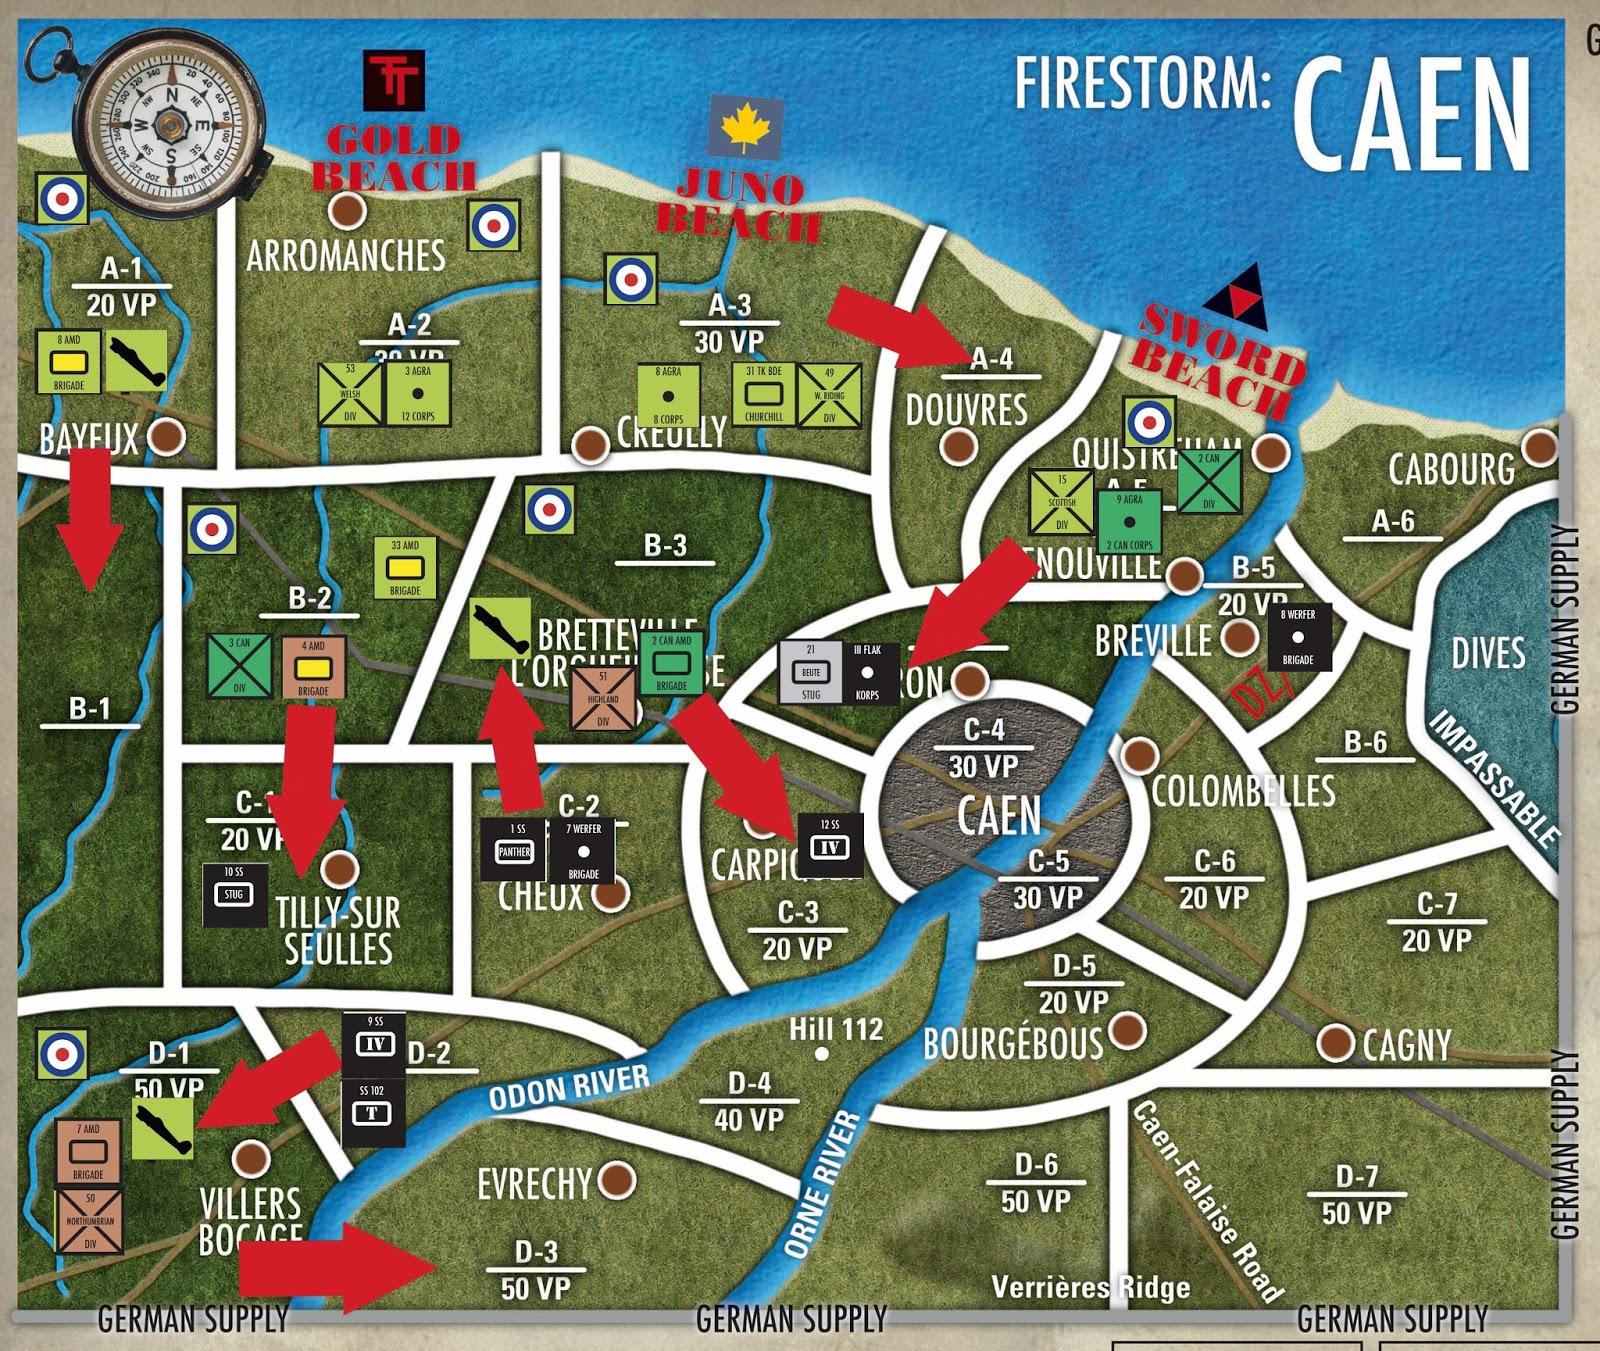 Rust and the City Firestorm Caen Turn 4